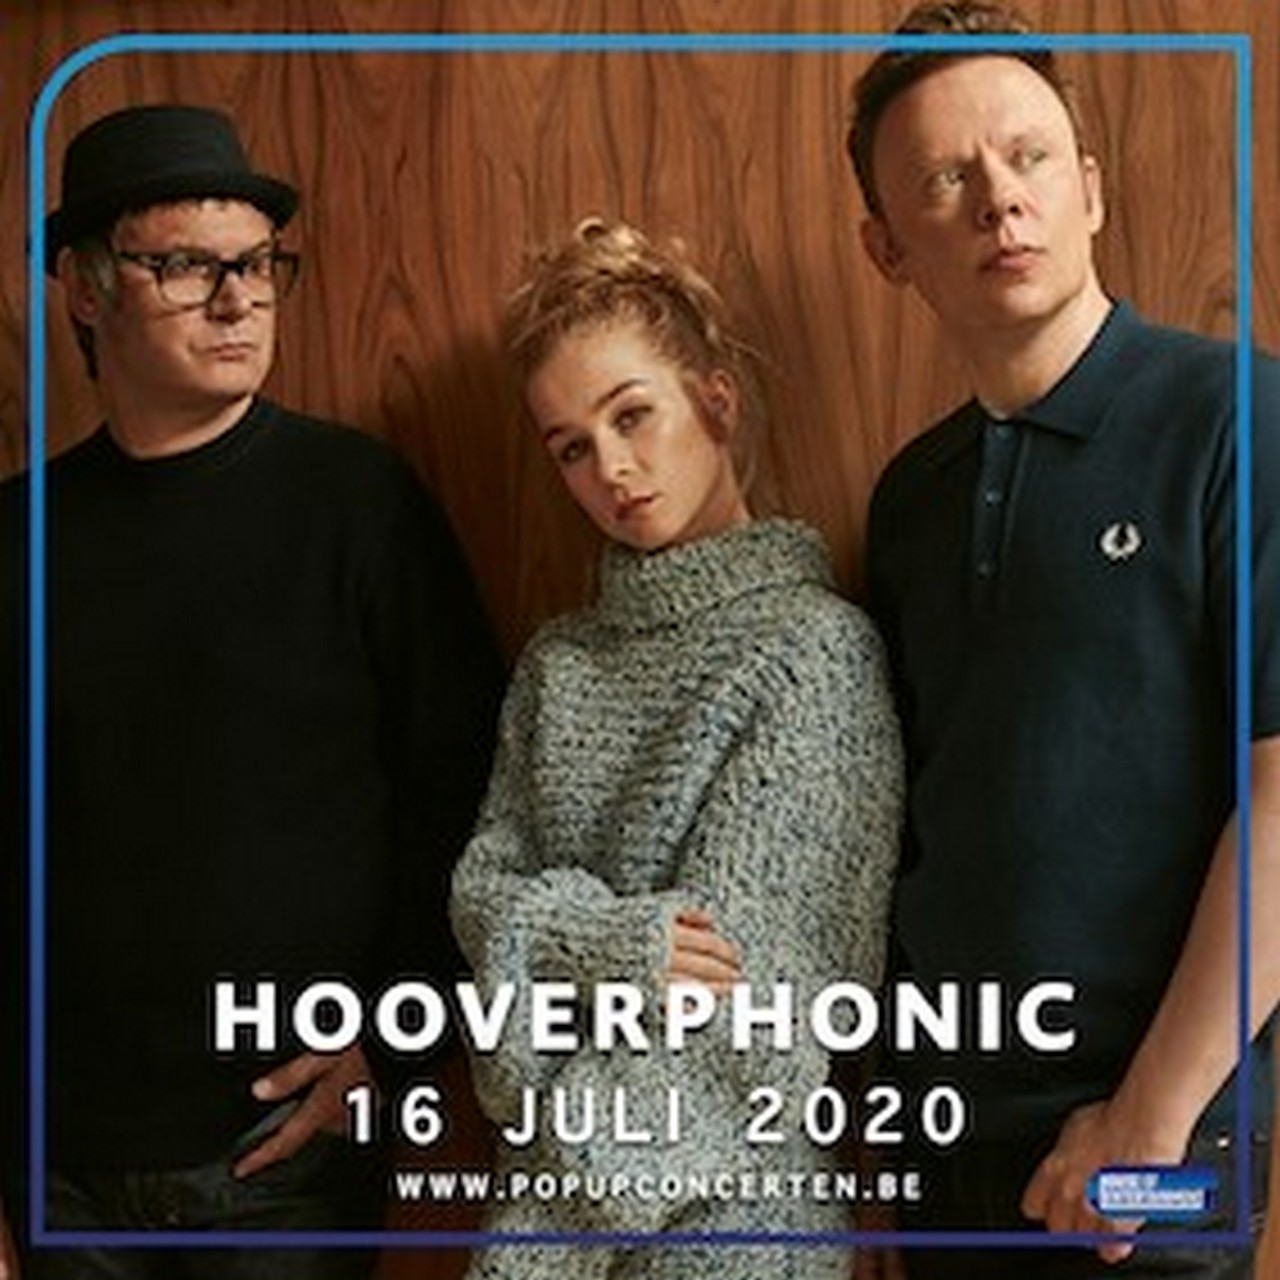 House of Entertainment pakt uit in Studio 100 Pop-Up Theater - Hooverphonic 16 juli 2020